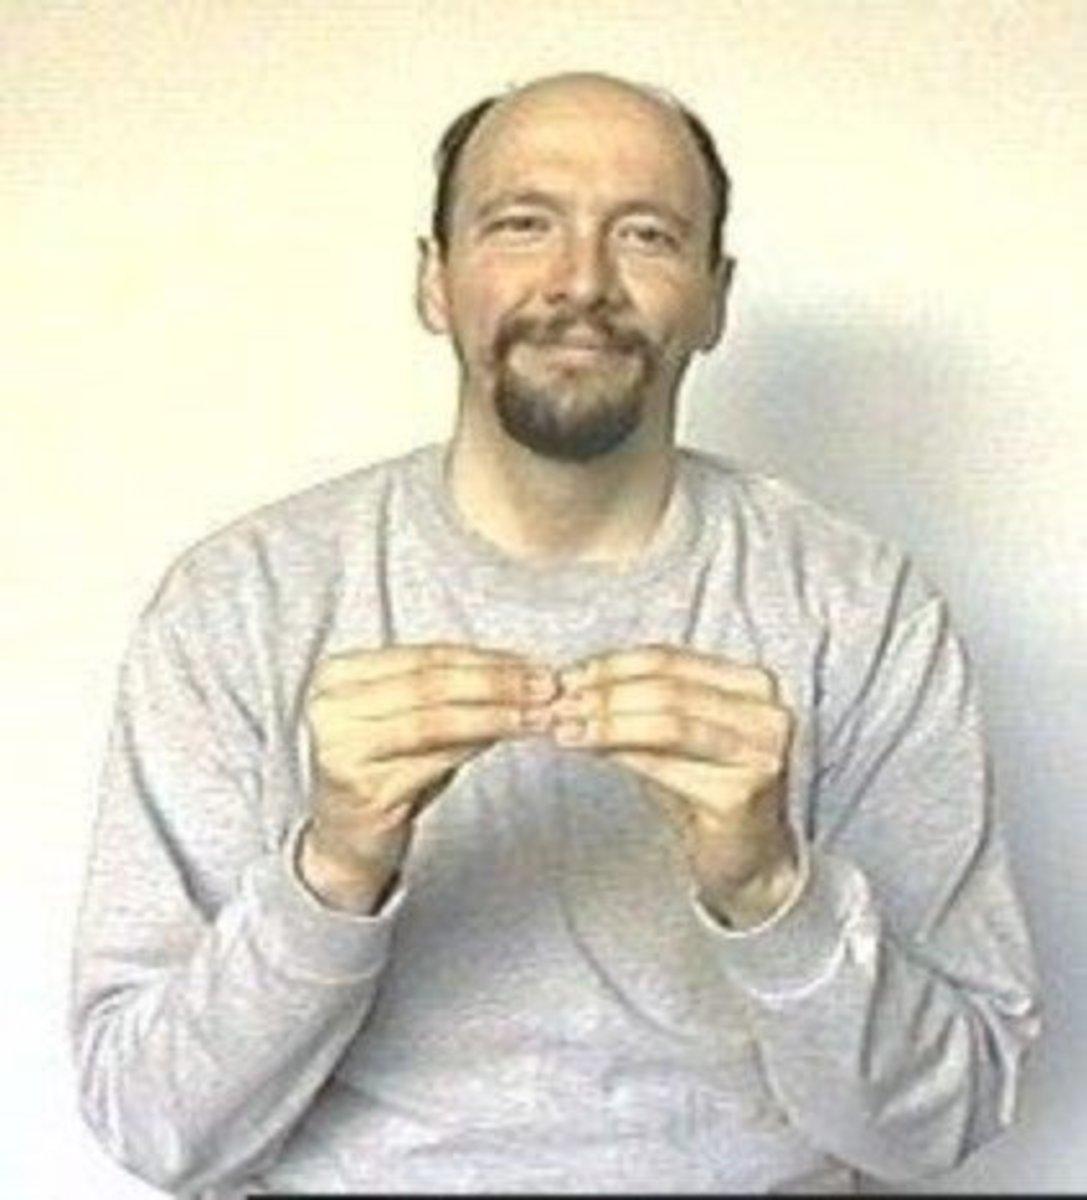 Signing More in ASL